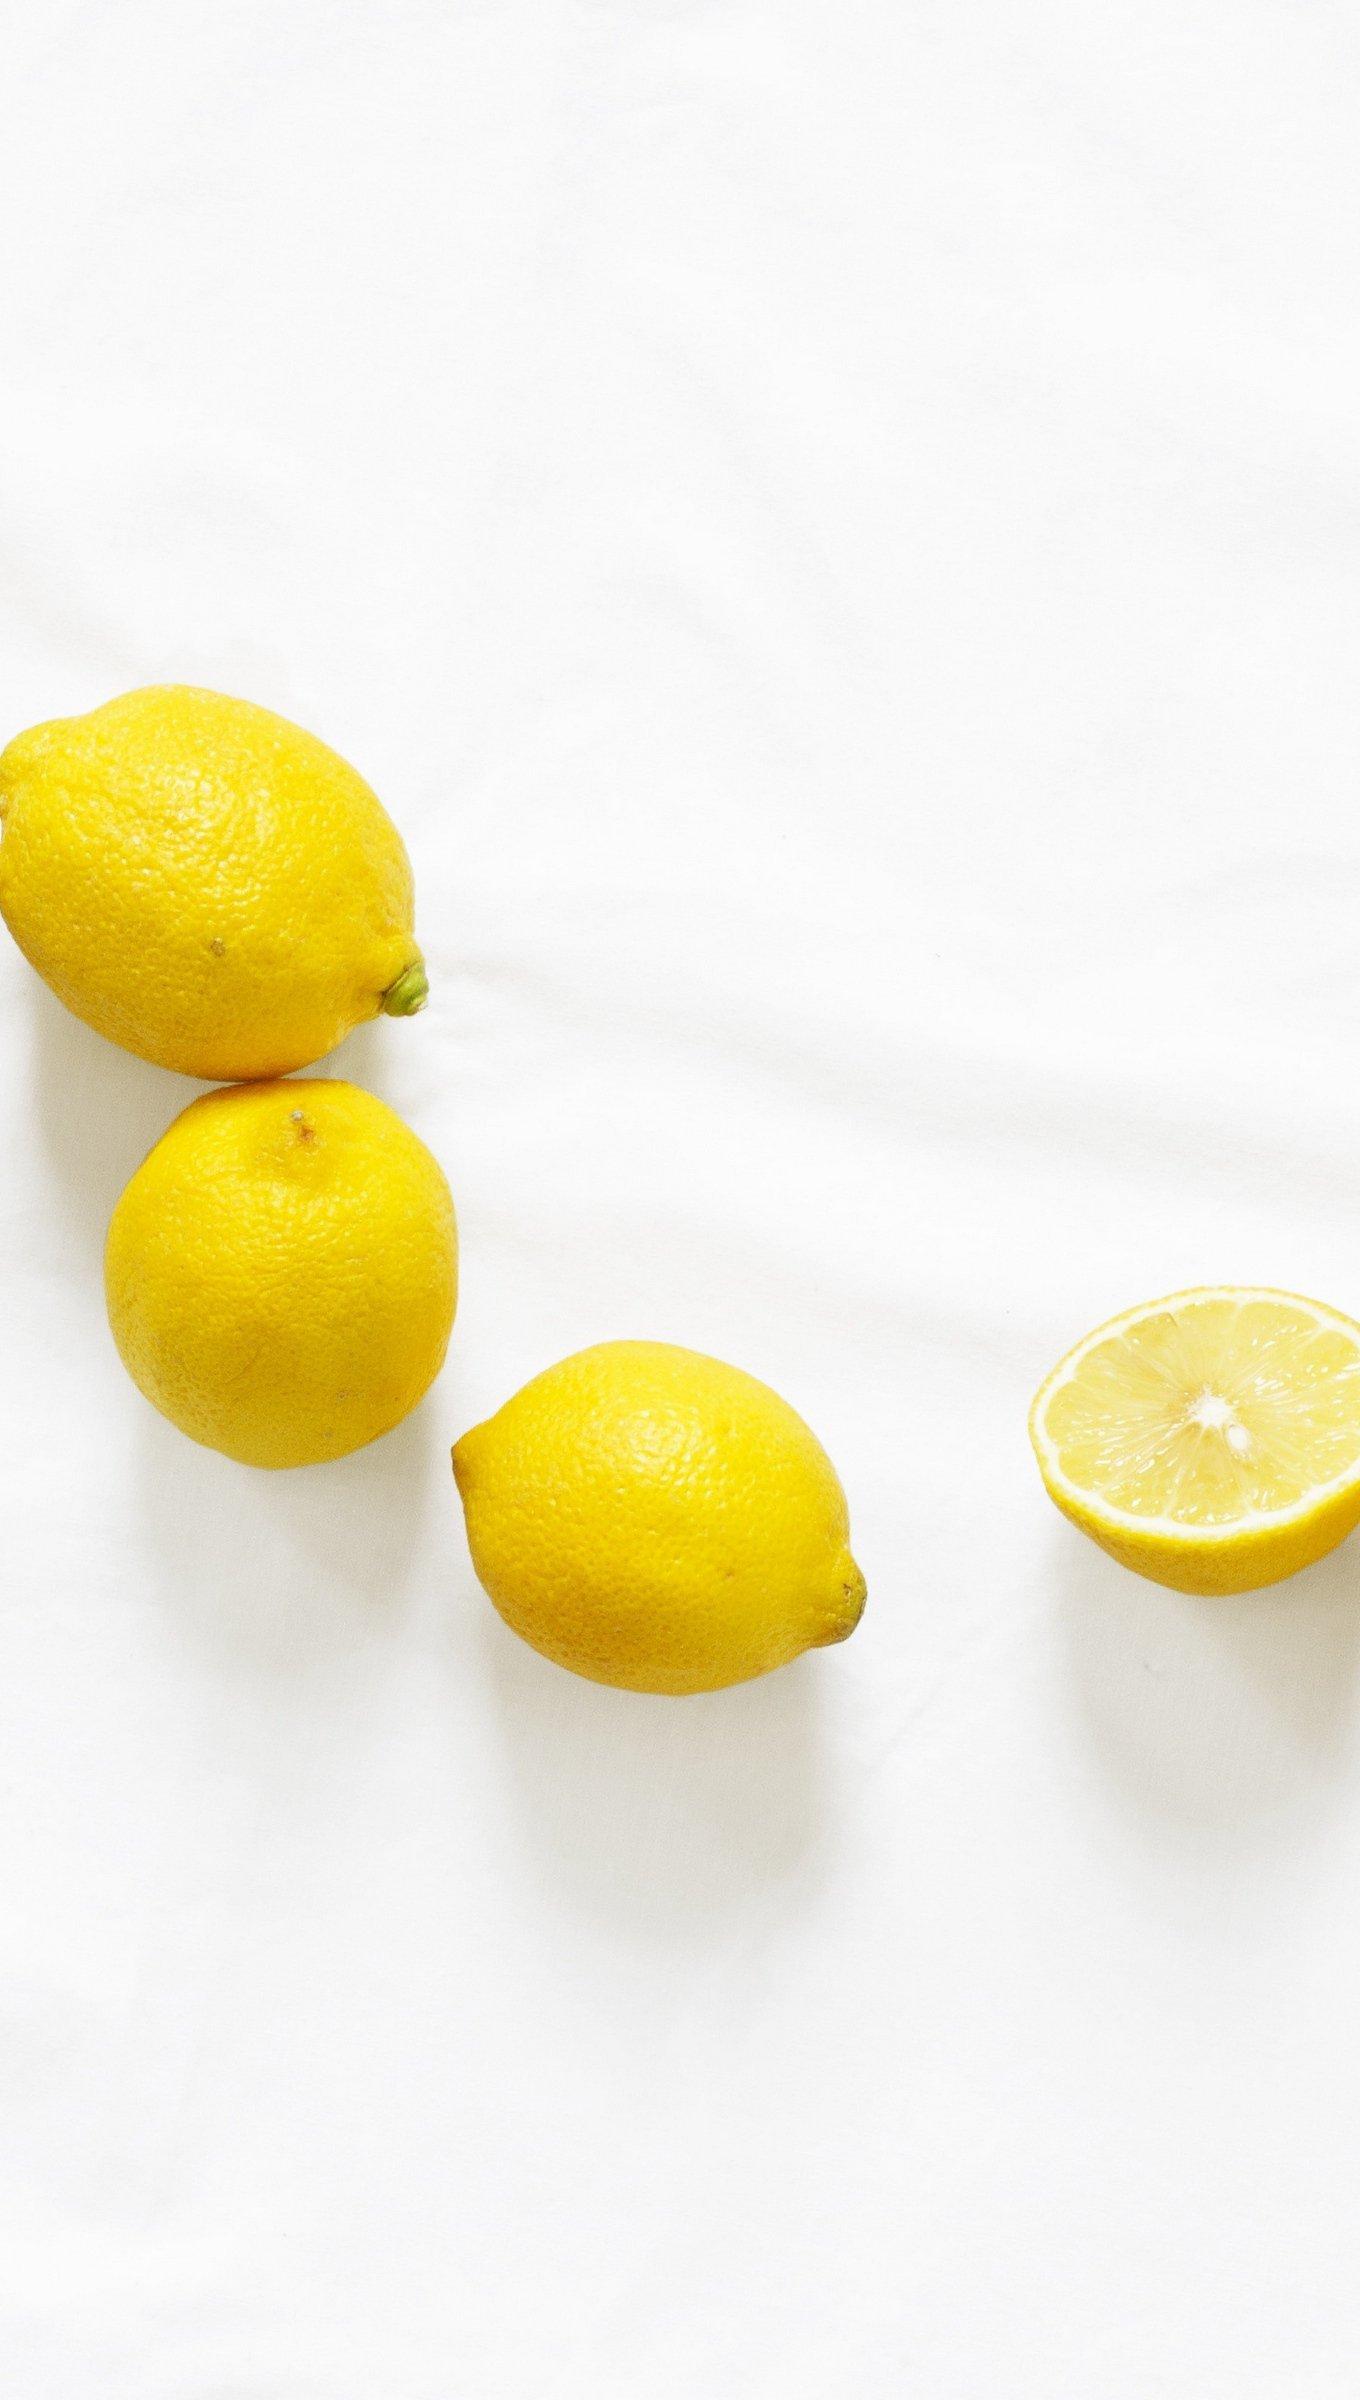 Fondos de pantalla Limones en fondo blanco Vertical